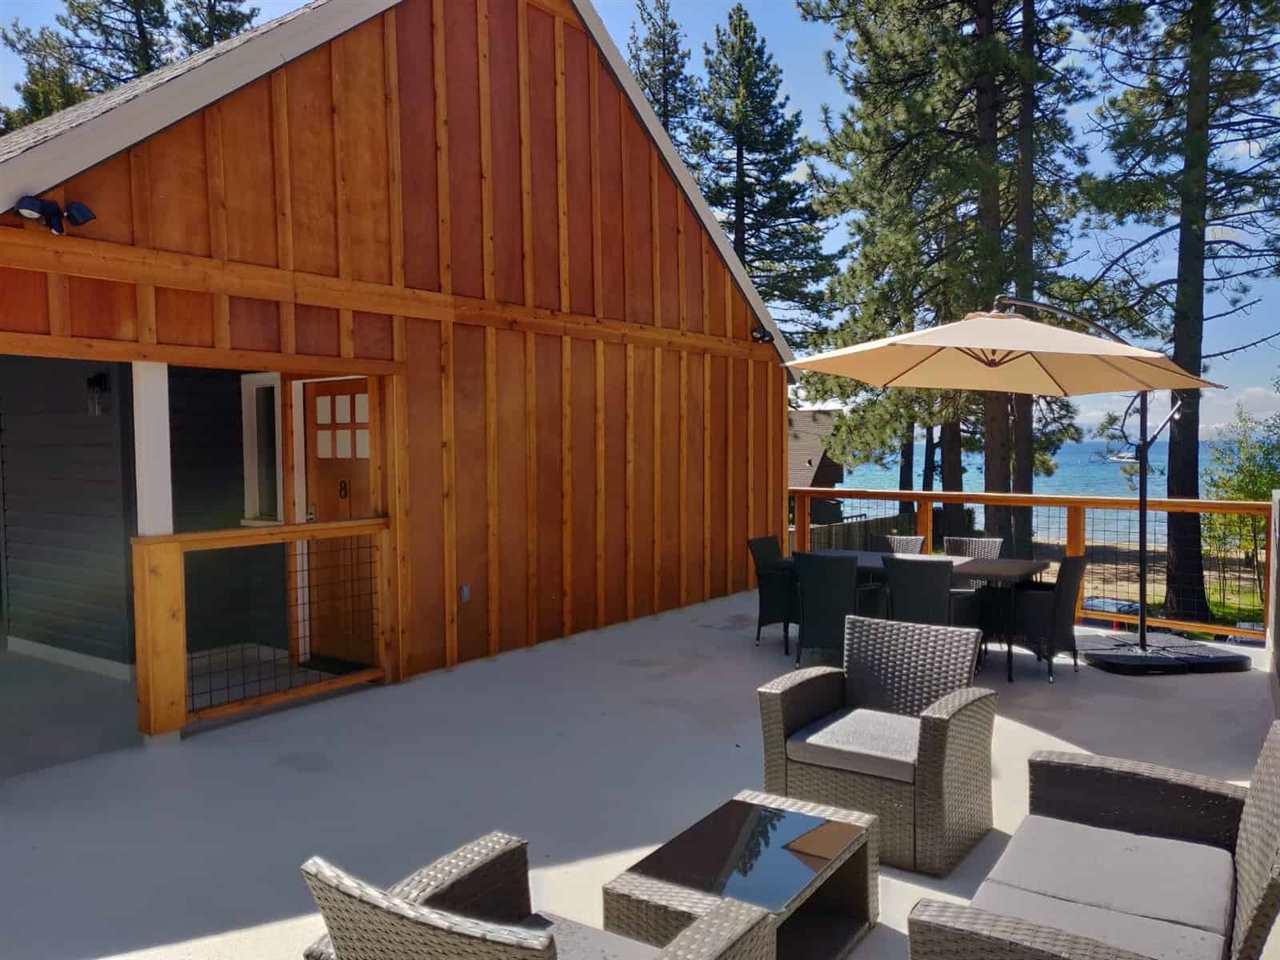 Image for 8092 North Lake Boulevard, Kings Beach, CA 96143